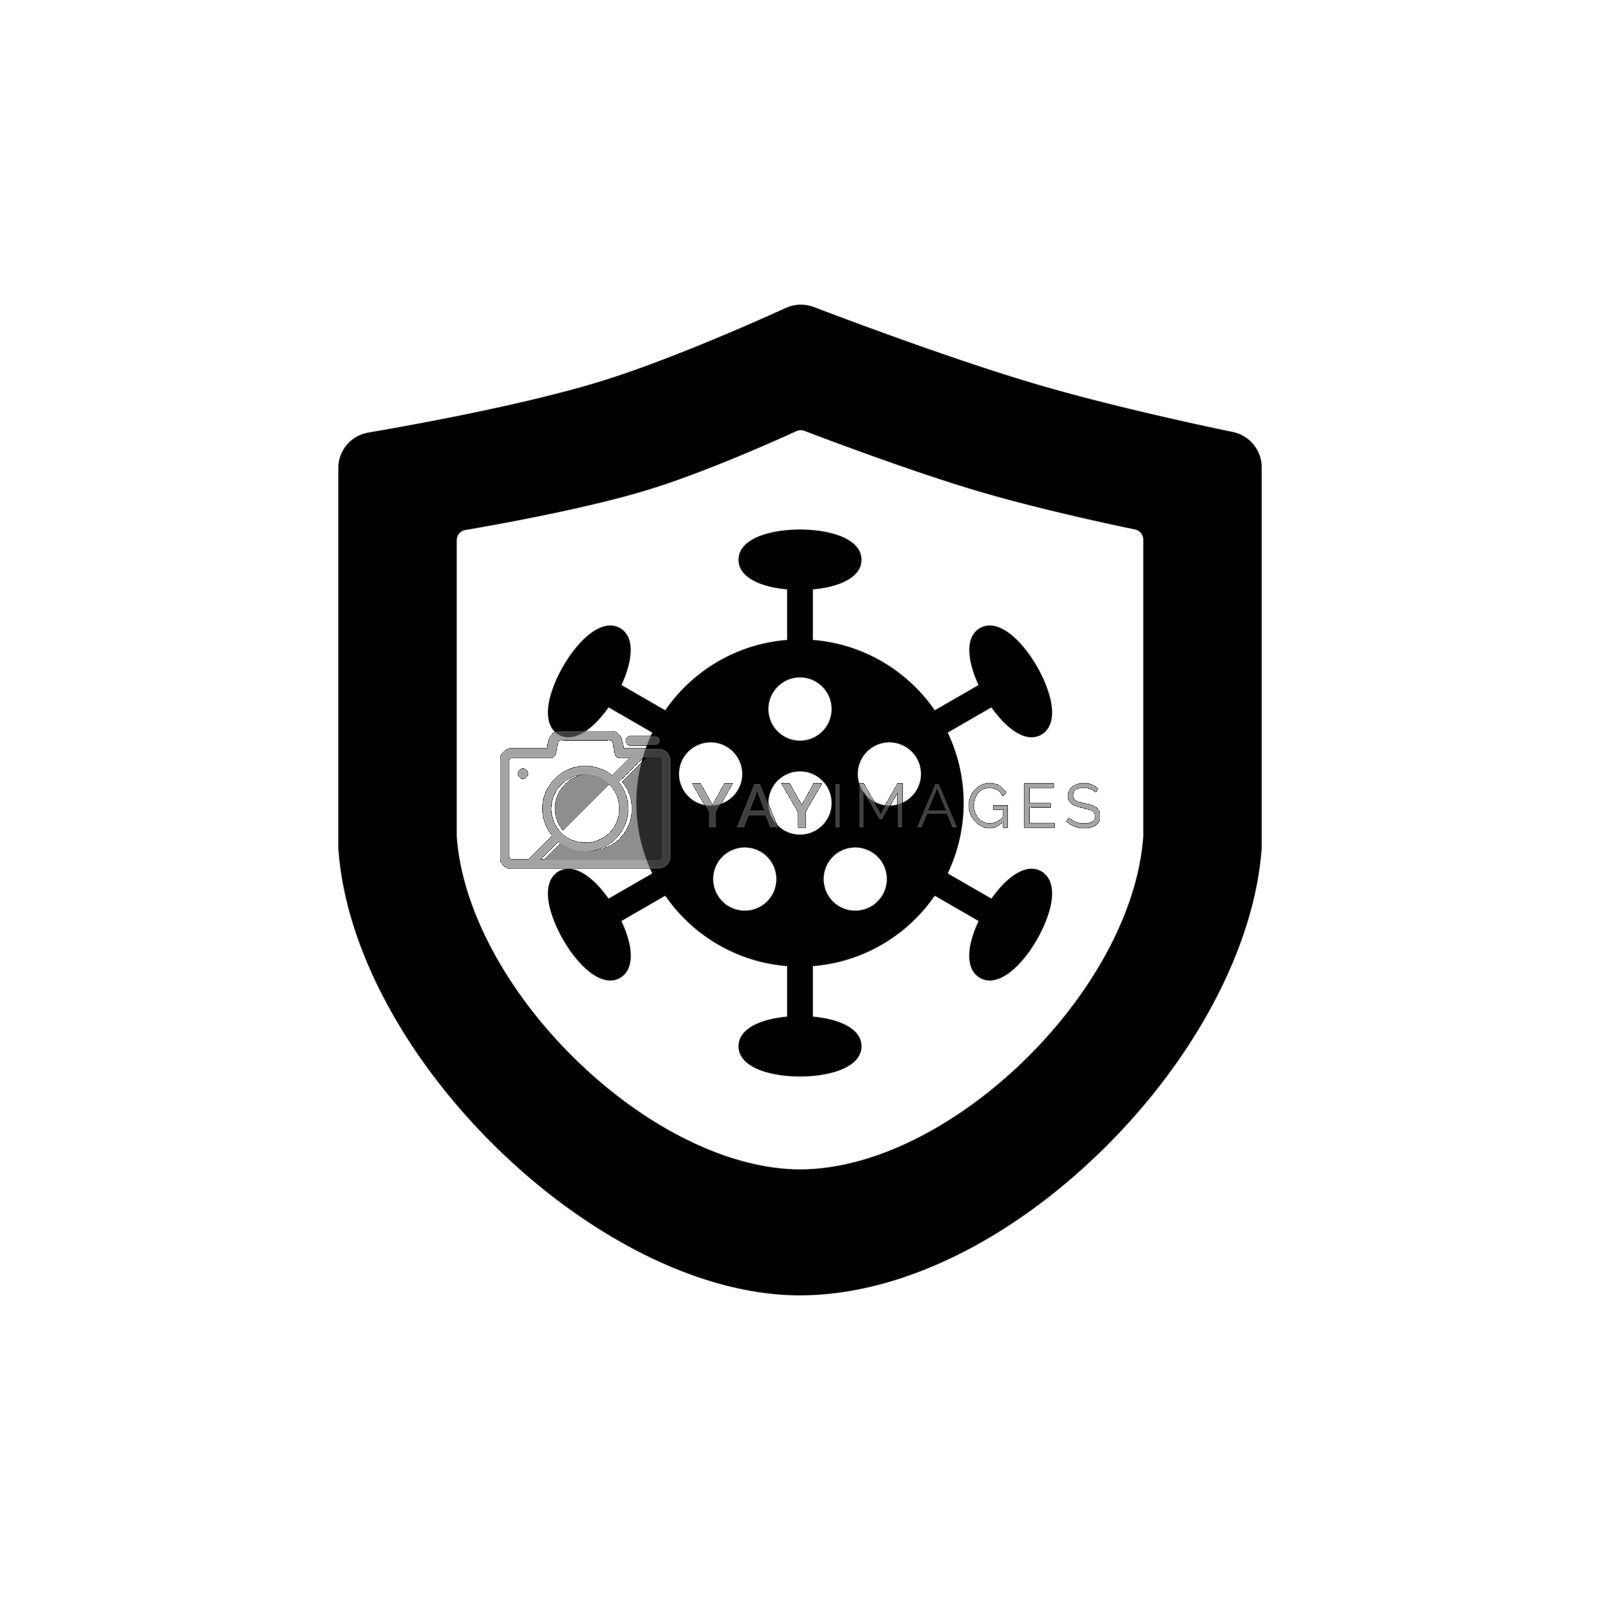 Corona virus protection vector glyph icon. Medical sign. Coronavirus. Graph symbol for medical web site and apps design, logo, app, UI